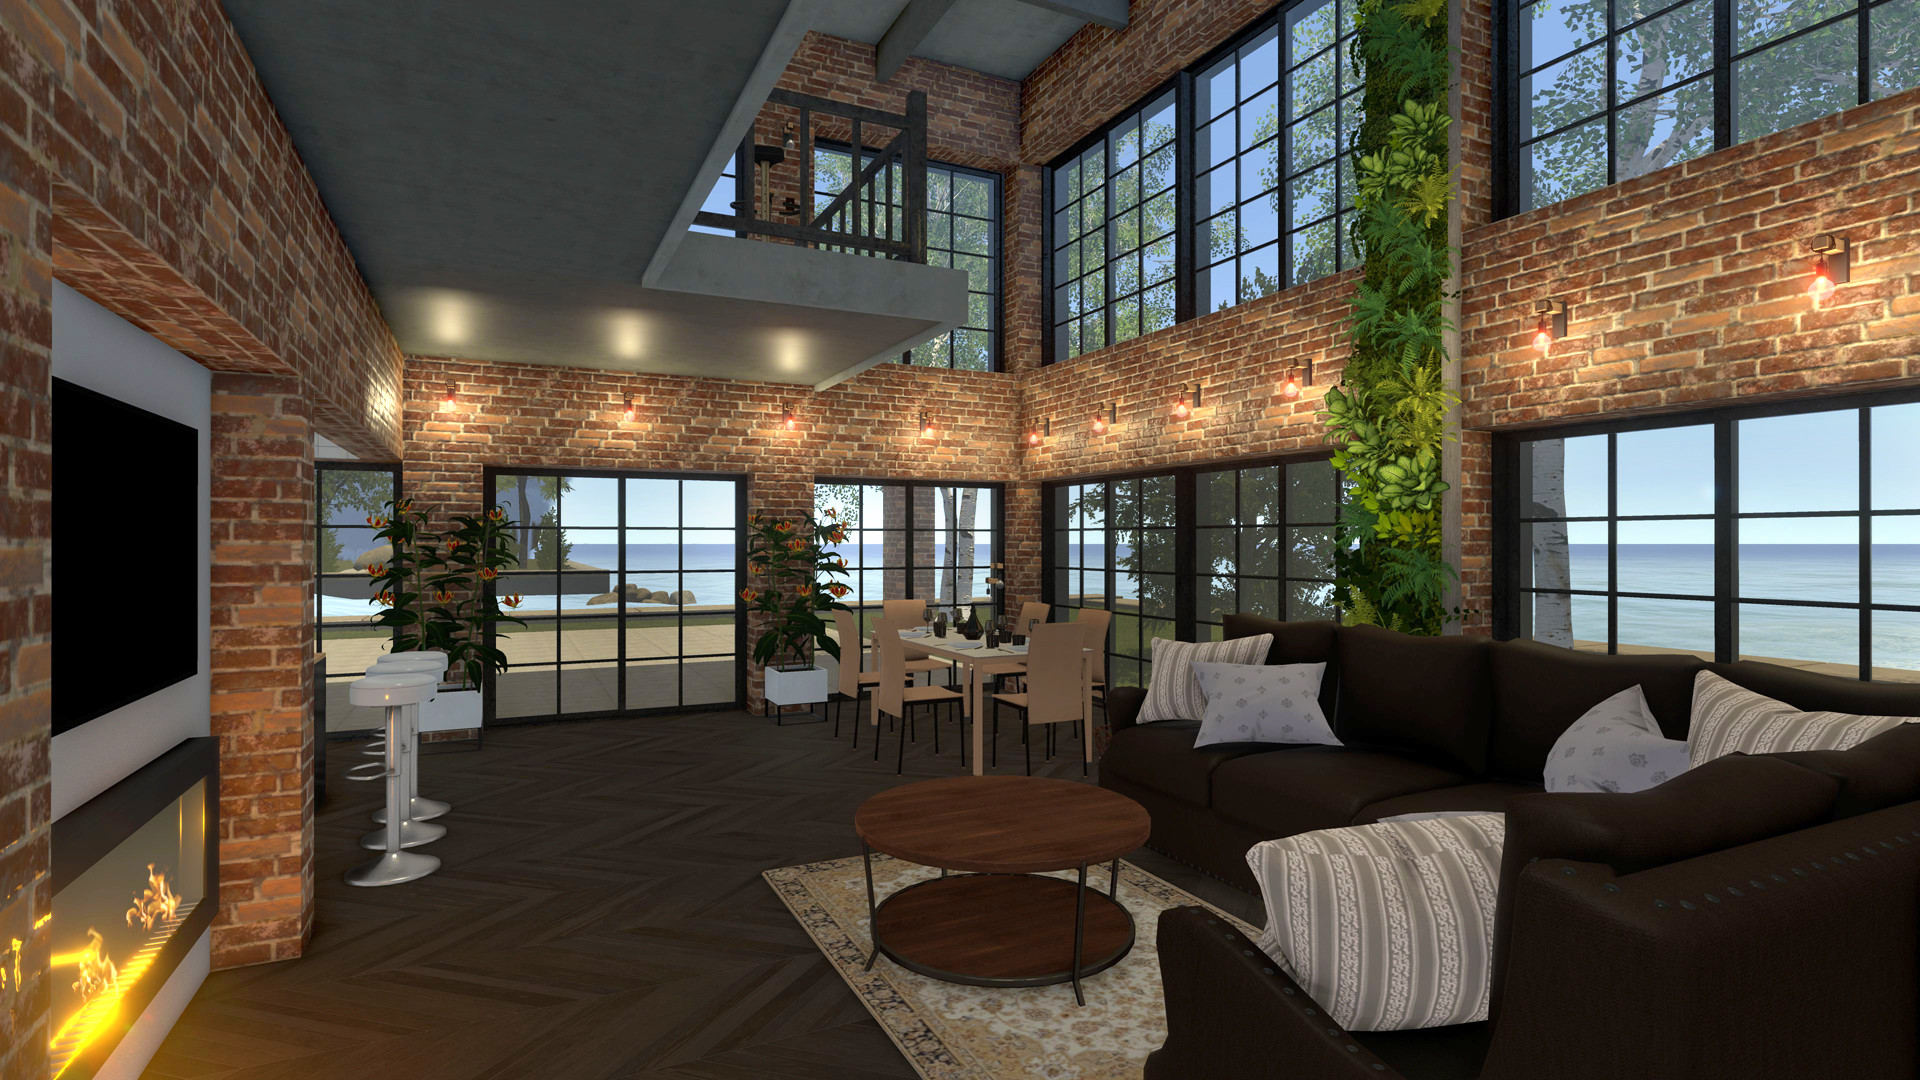 House Flipper Luxury Dlc On Steam